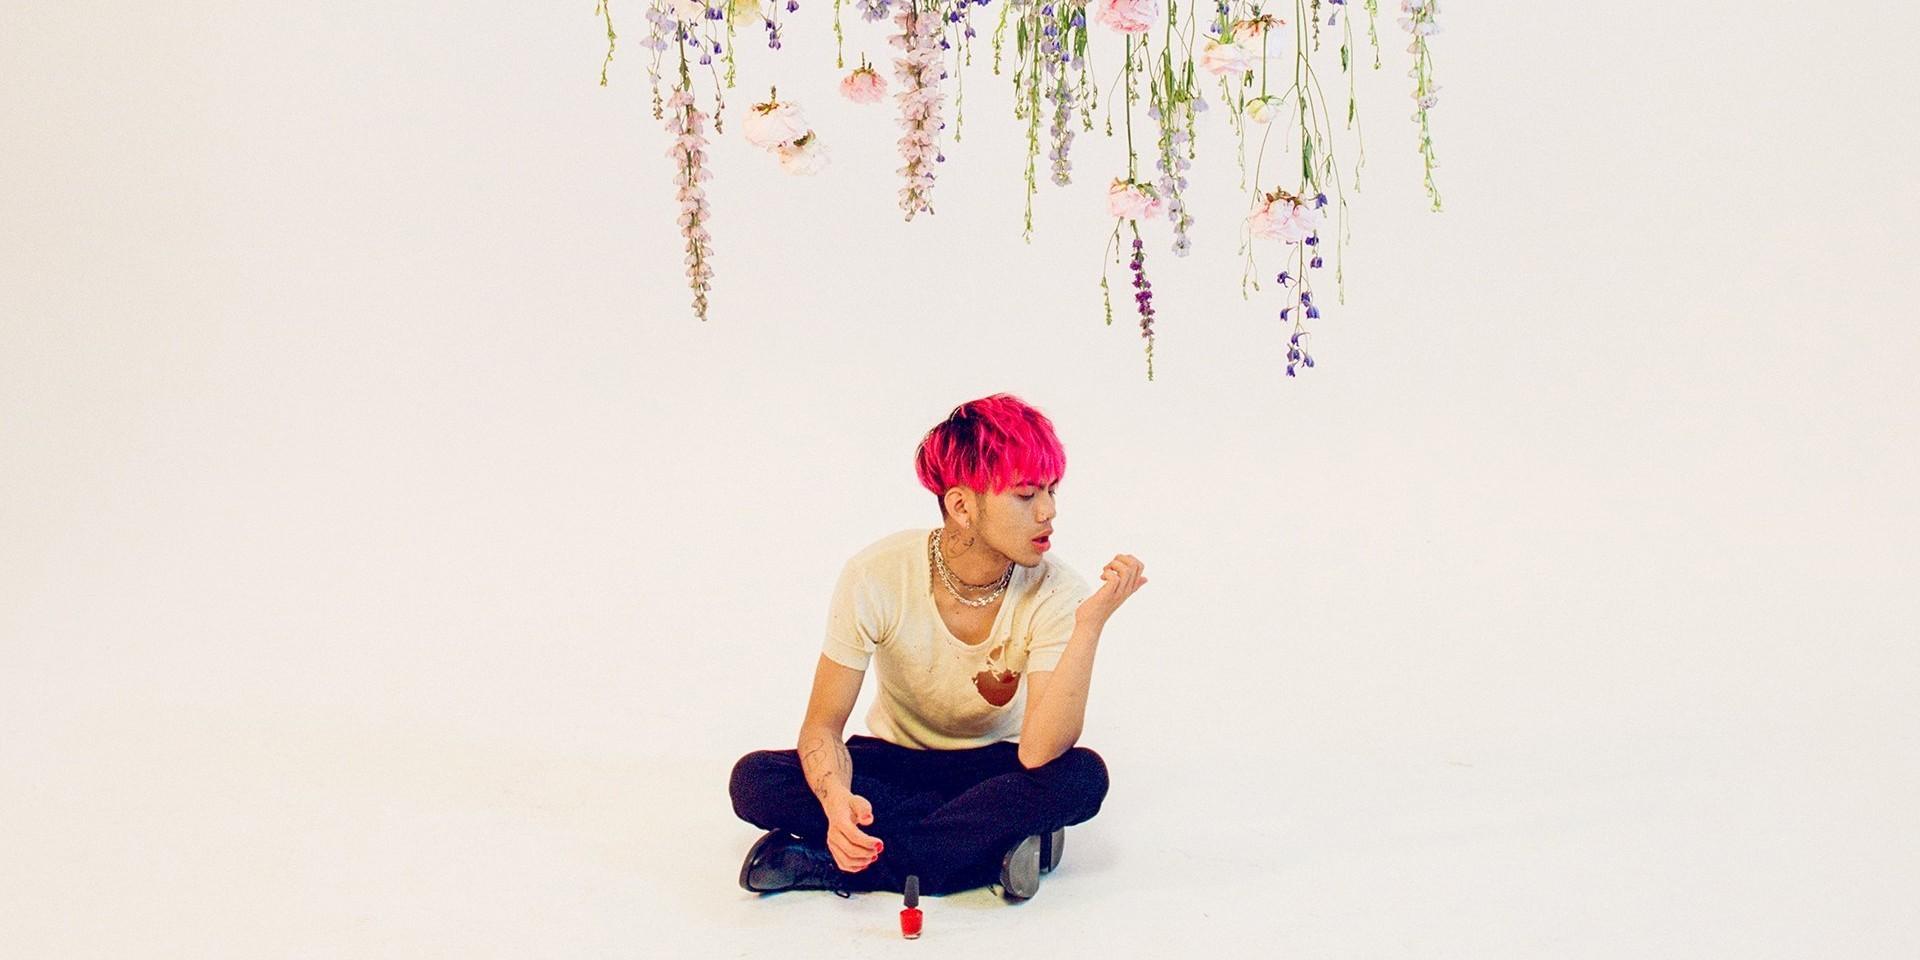 no rome debuts new upbeat track 'Saint Laurent' on Beats 1 – watch